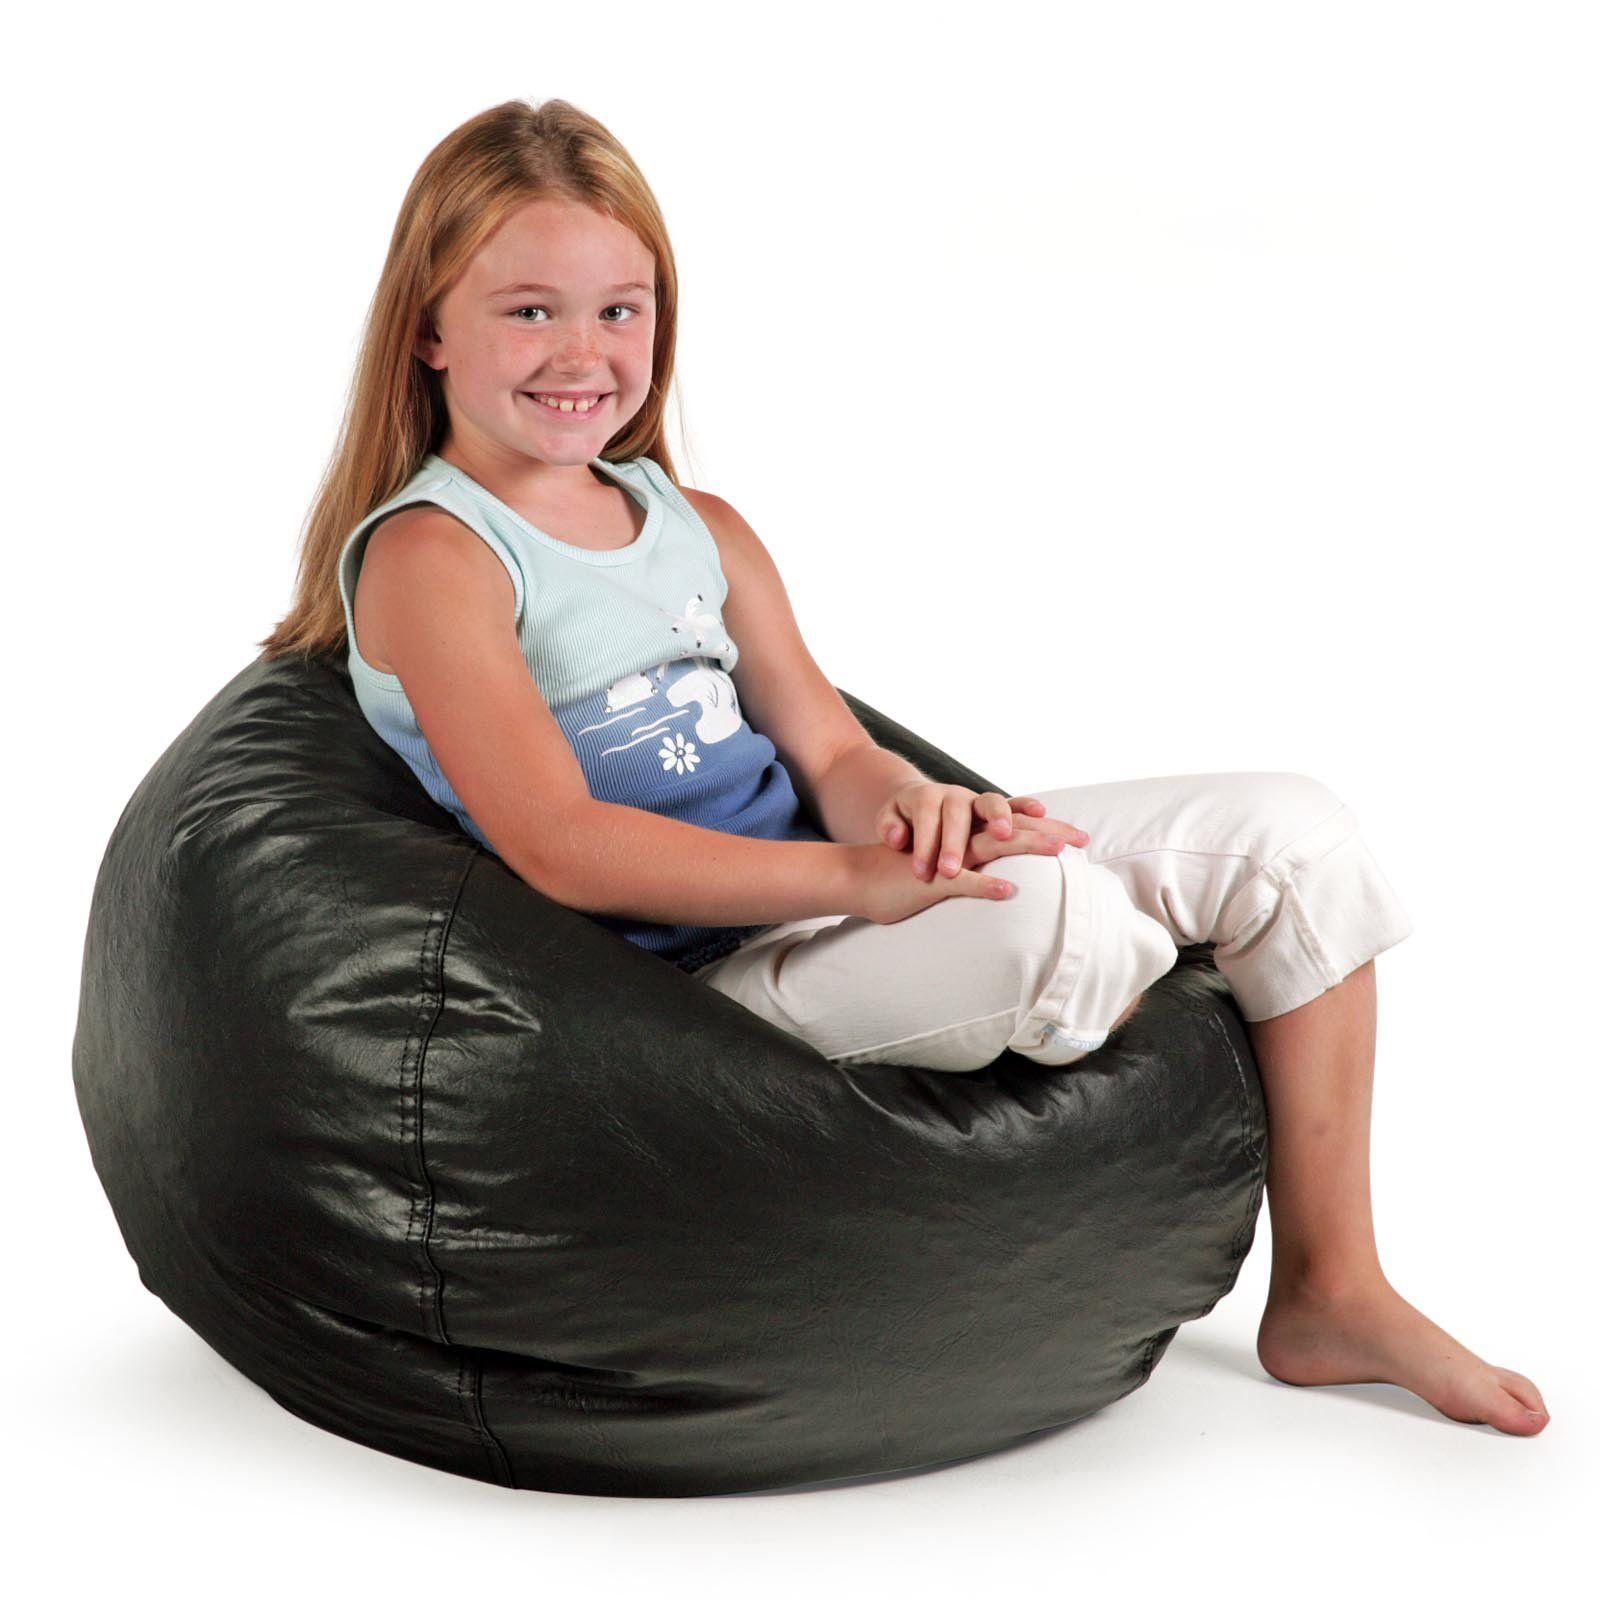 Small Standard Vinyl Bean Bag Chair from